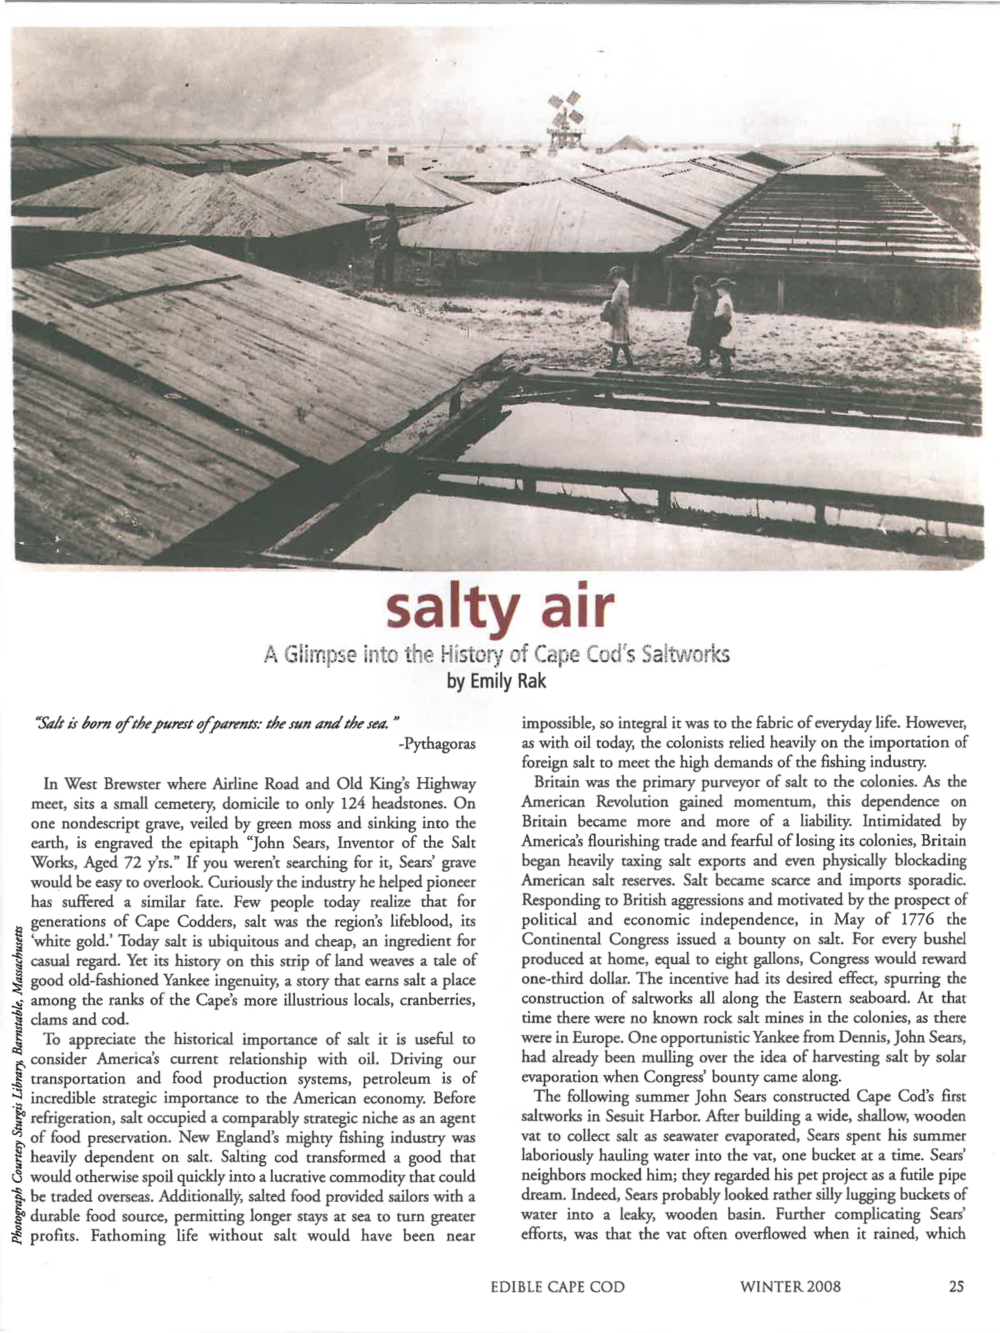 Salty Air Edible Cape Cod | www.hungryinlove.com